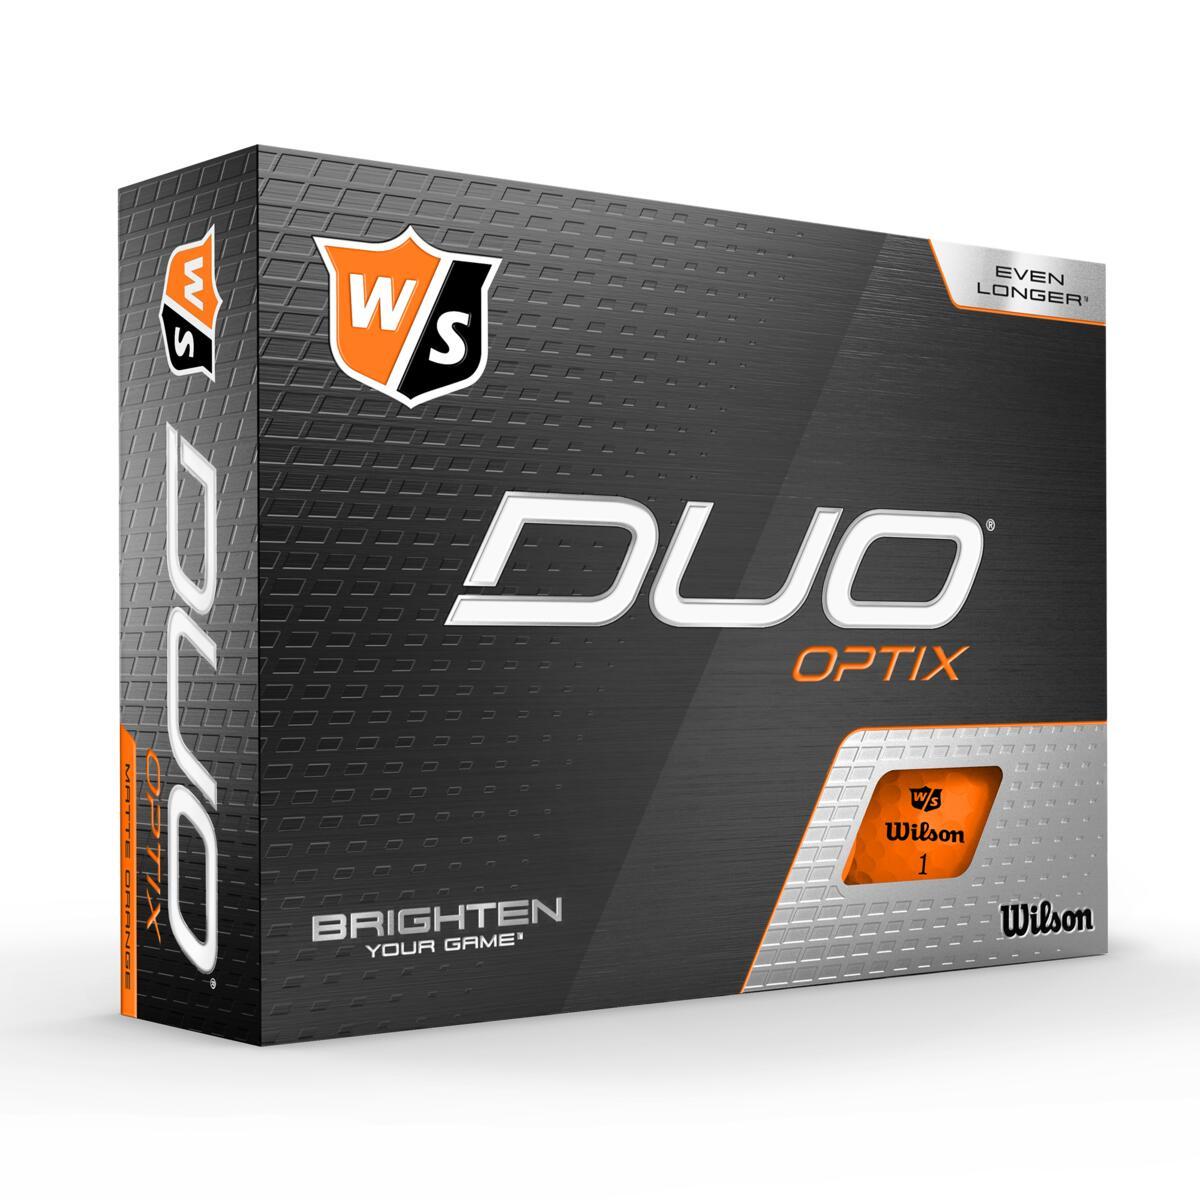 Wilson - Duo OPTIX Orange 12pack Golf Balls